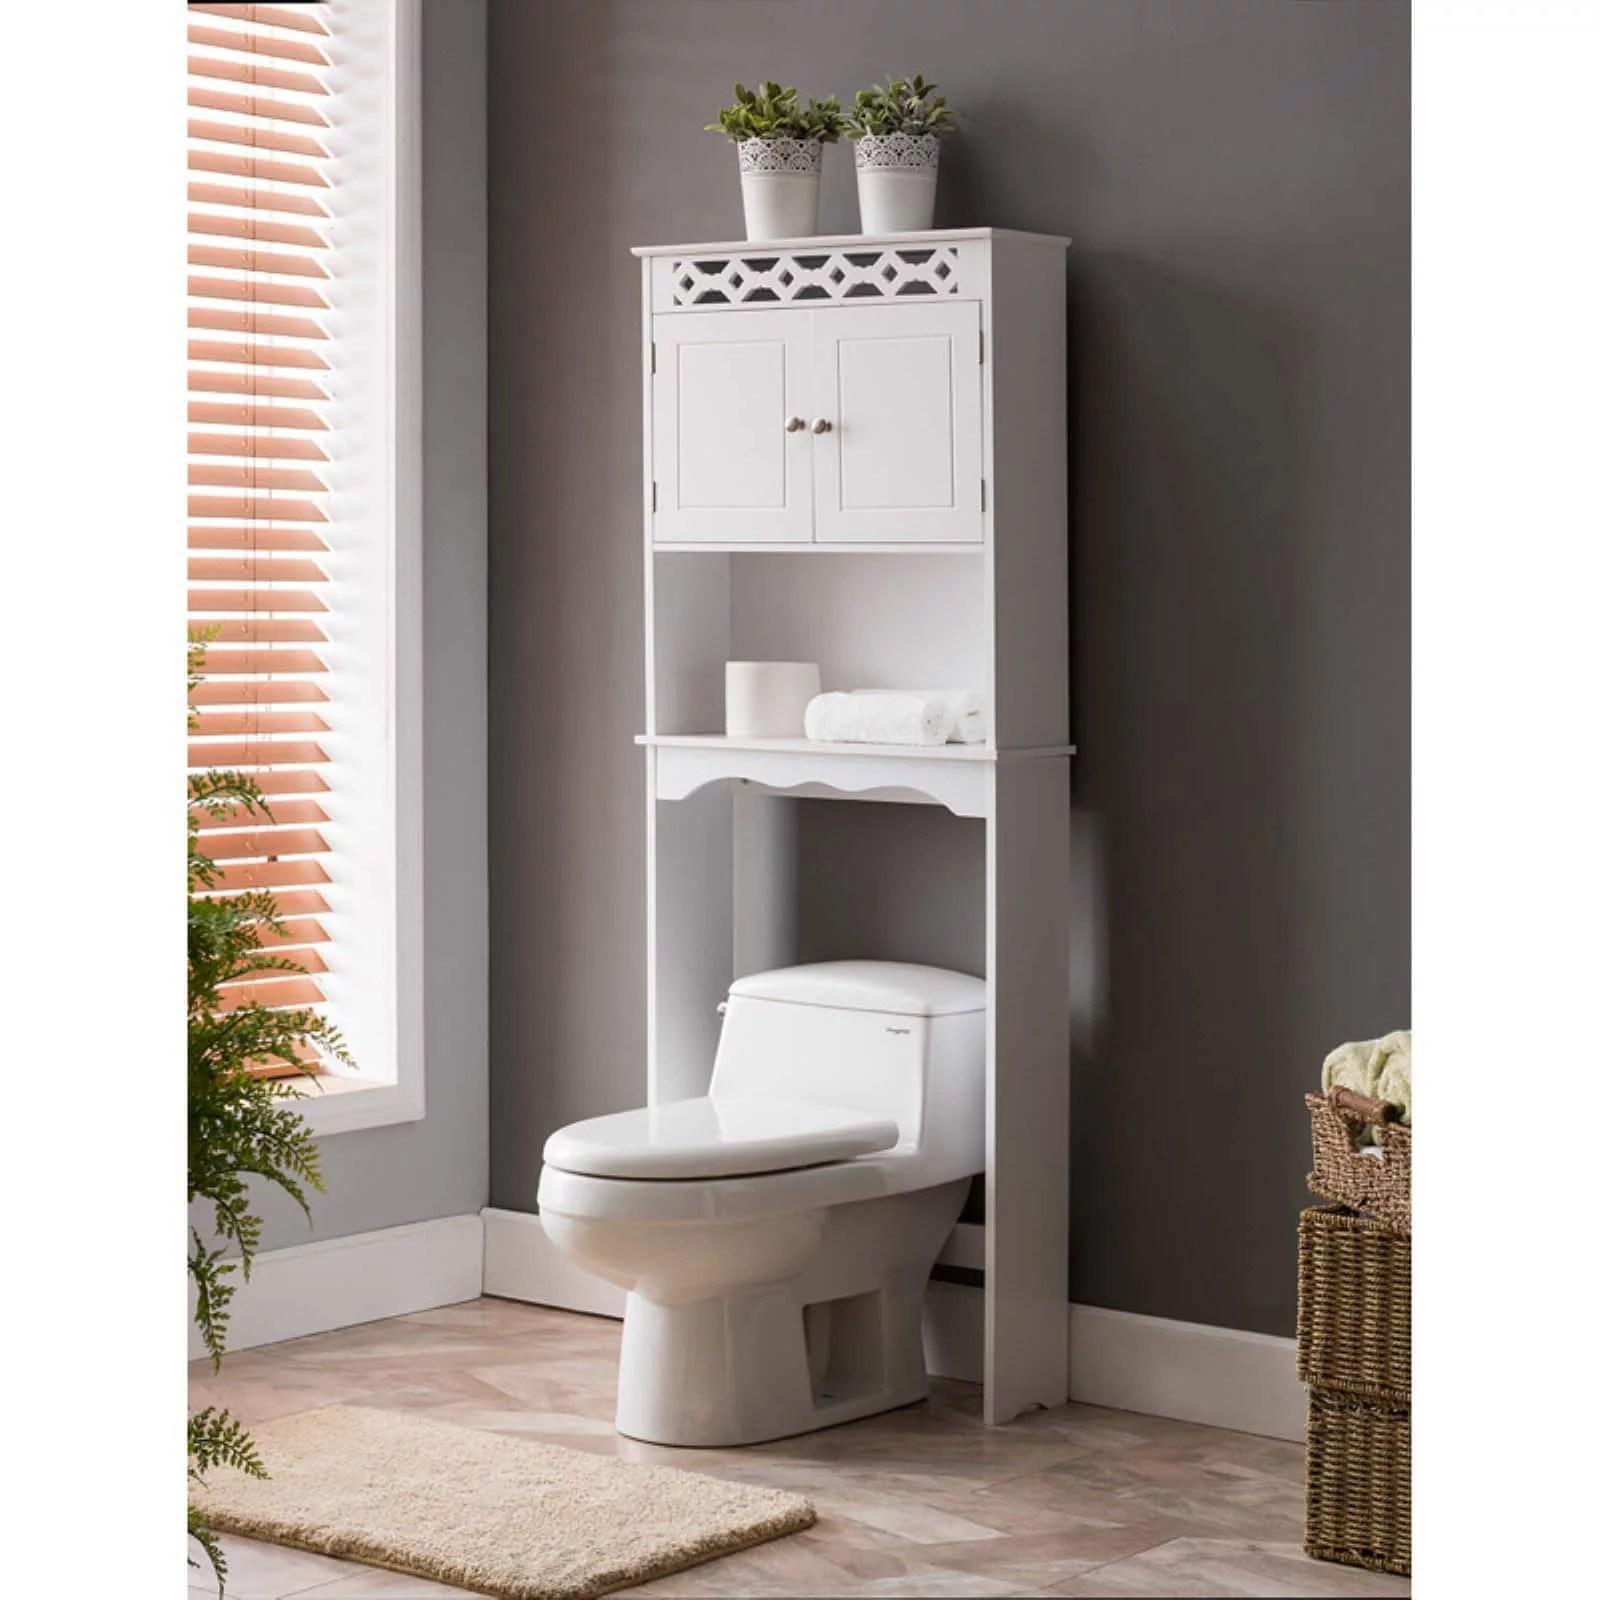 k b furniture bm1133 wood bathroom rack